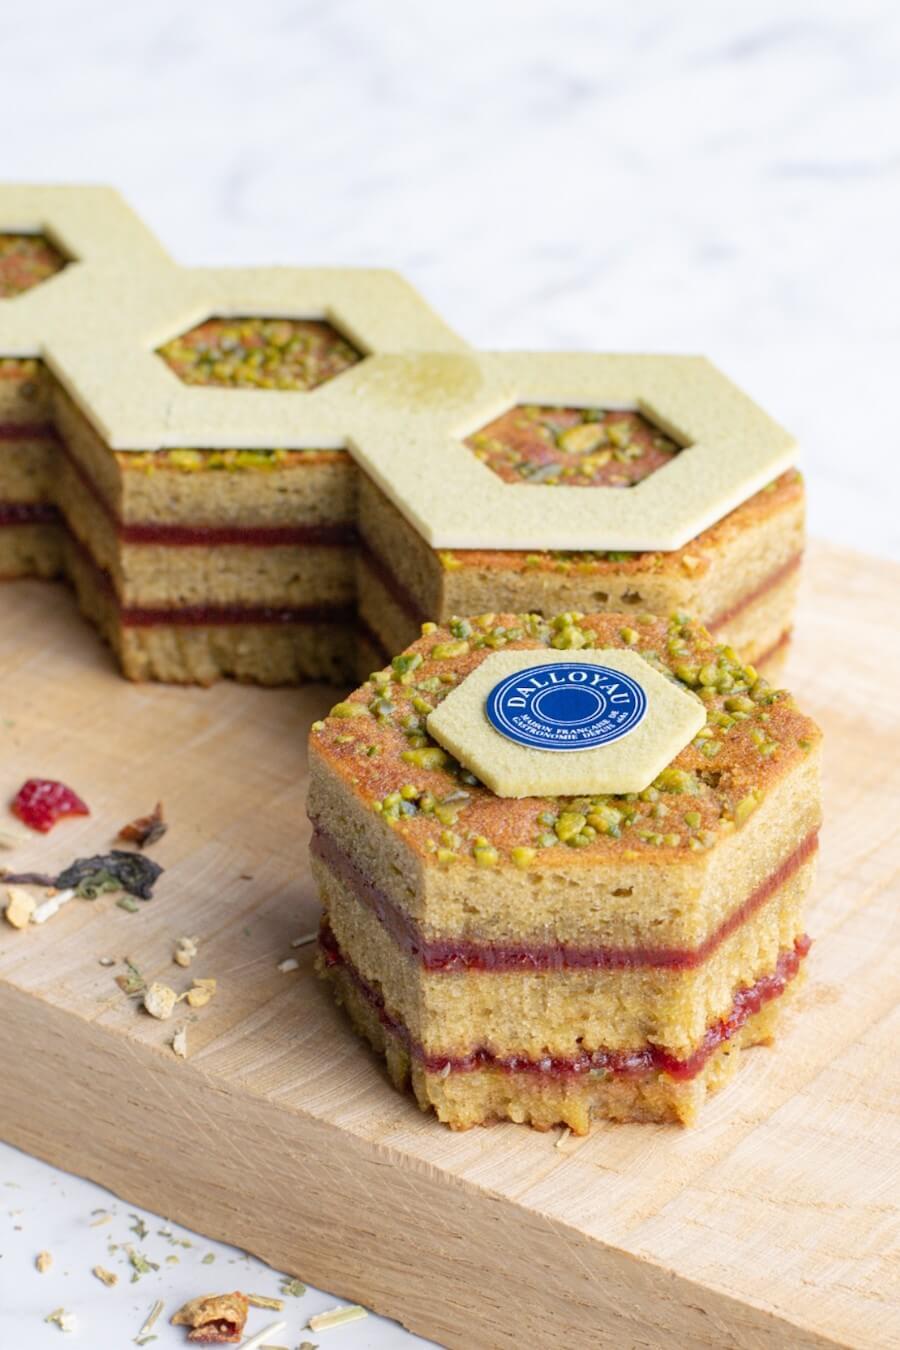 CAKE DIVINE IDYLLE